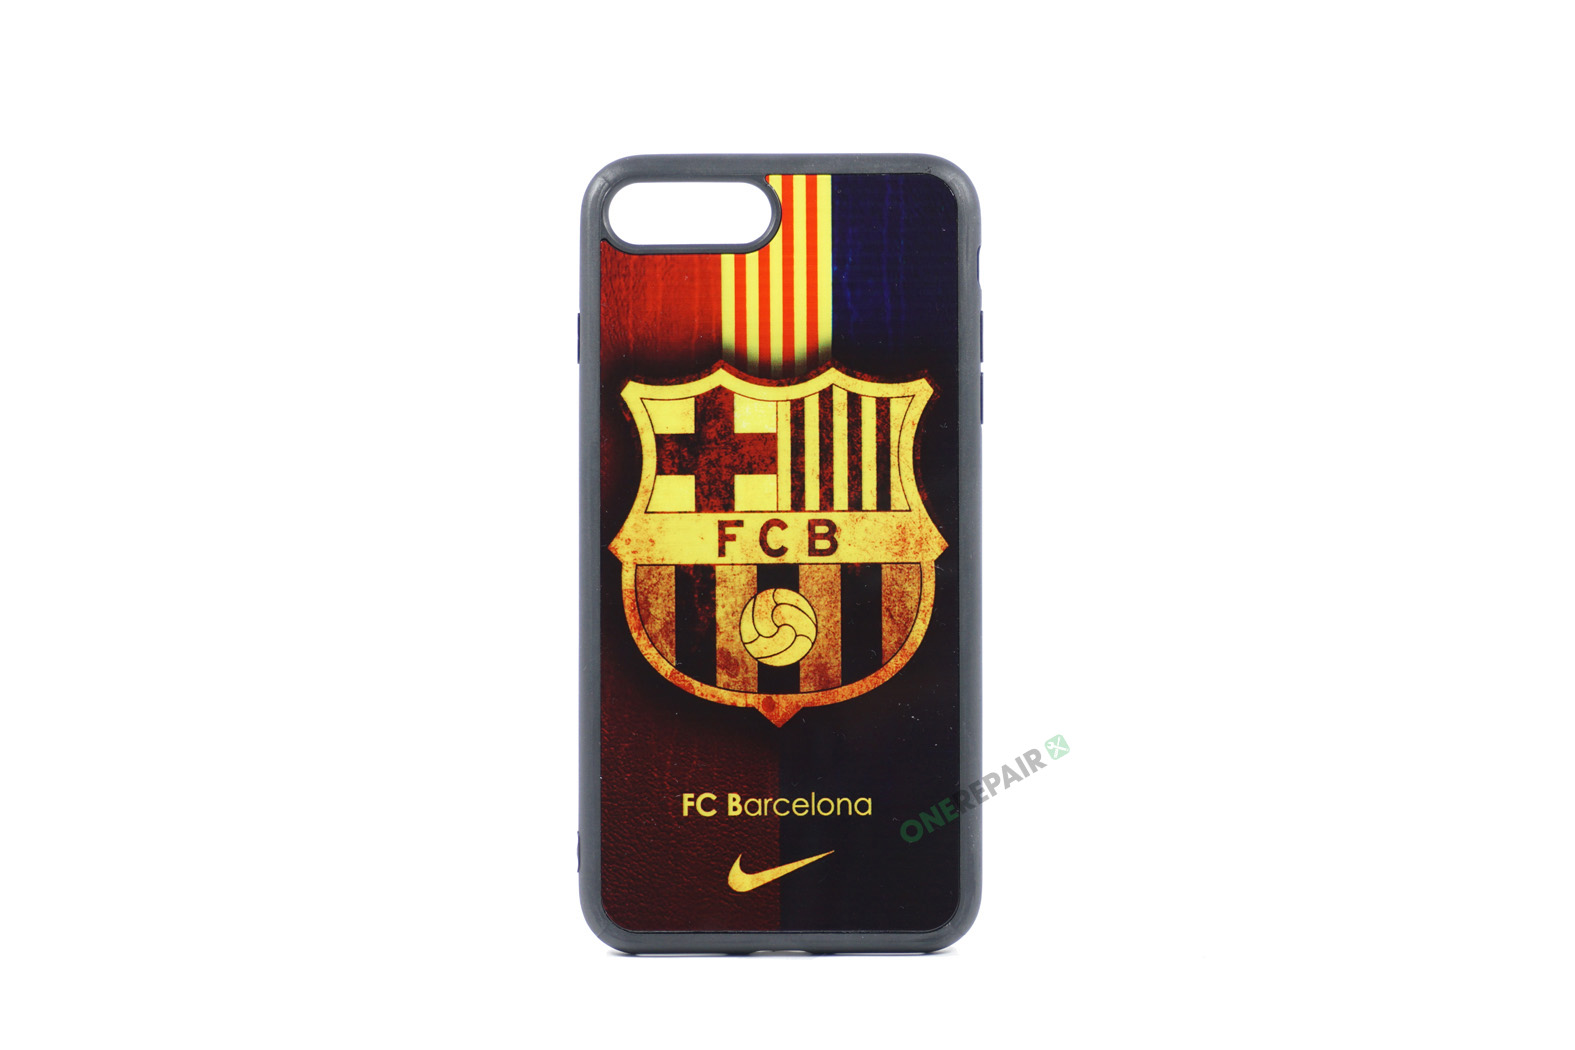 350861_iPhone_7+_8+_Plus_Fodbold_FC_Barcelona_FCB_Dark_Sort_Cover_OneRepair_WM_00001